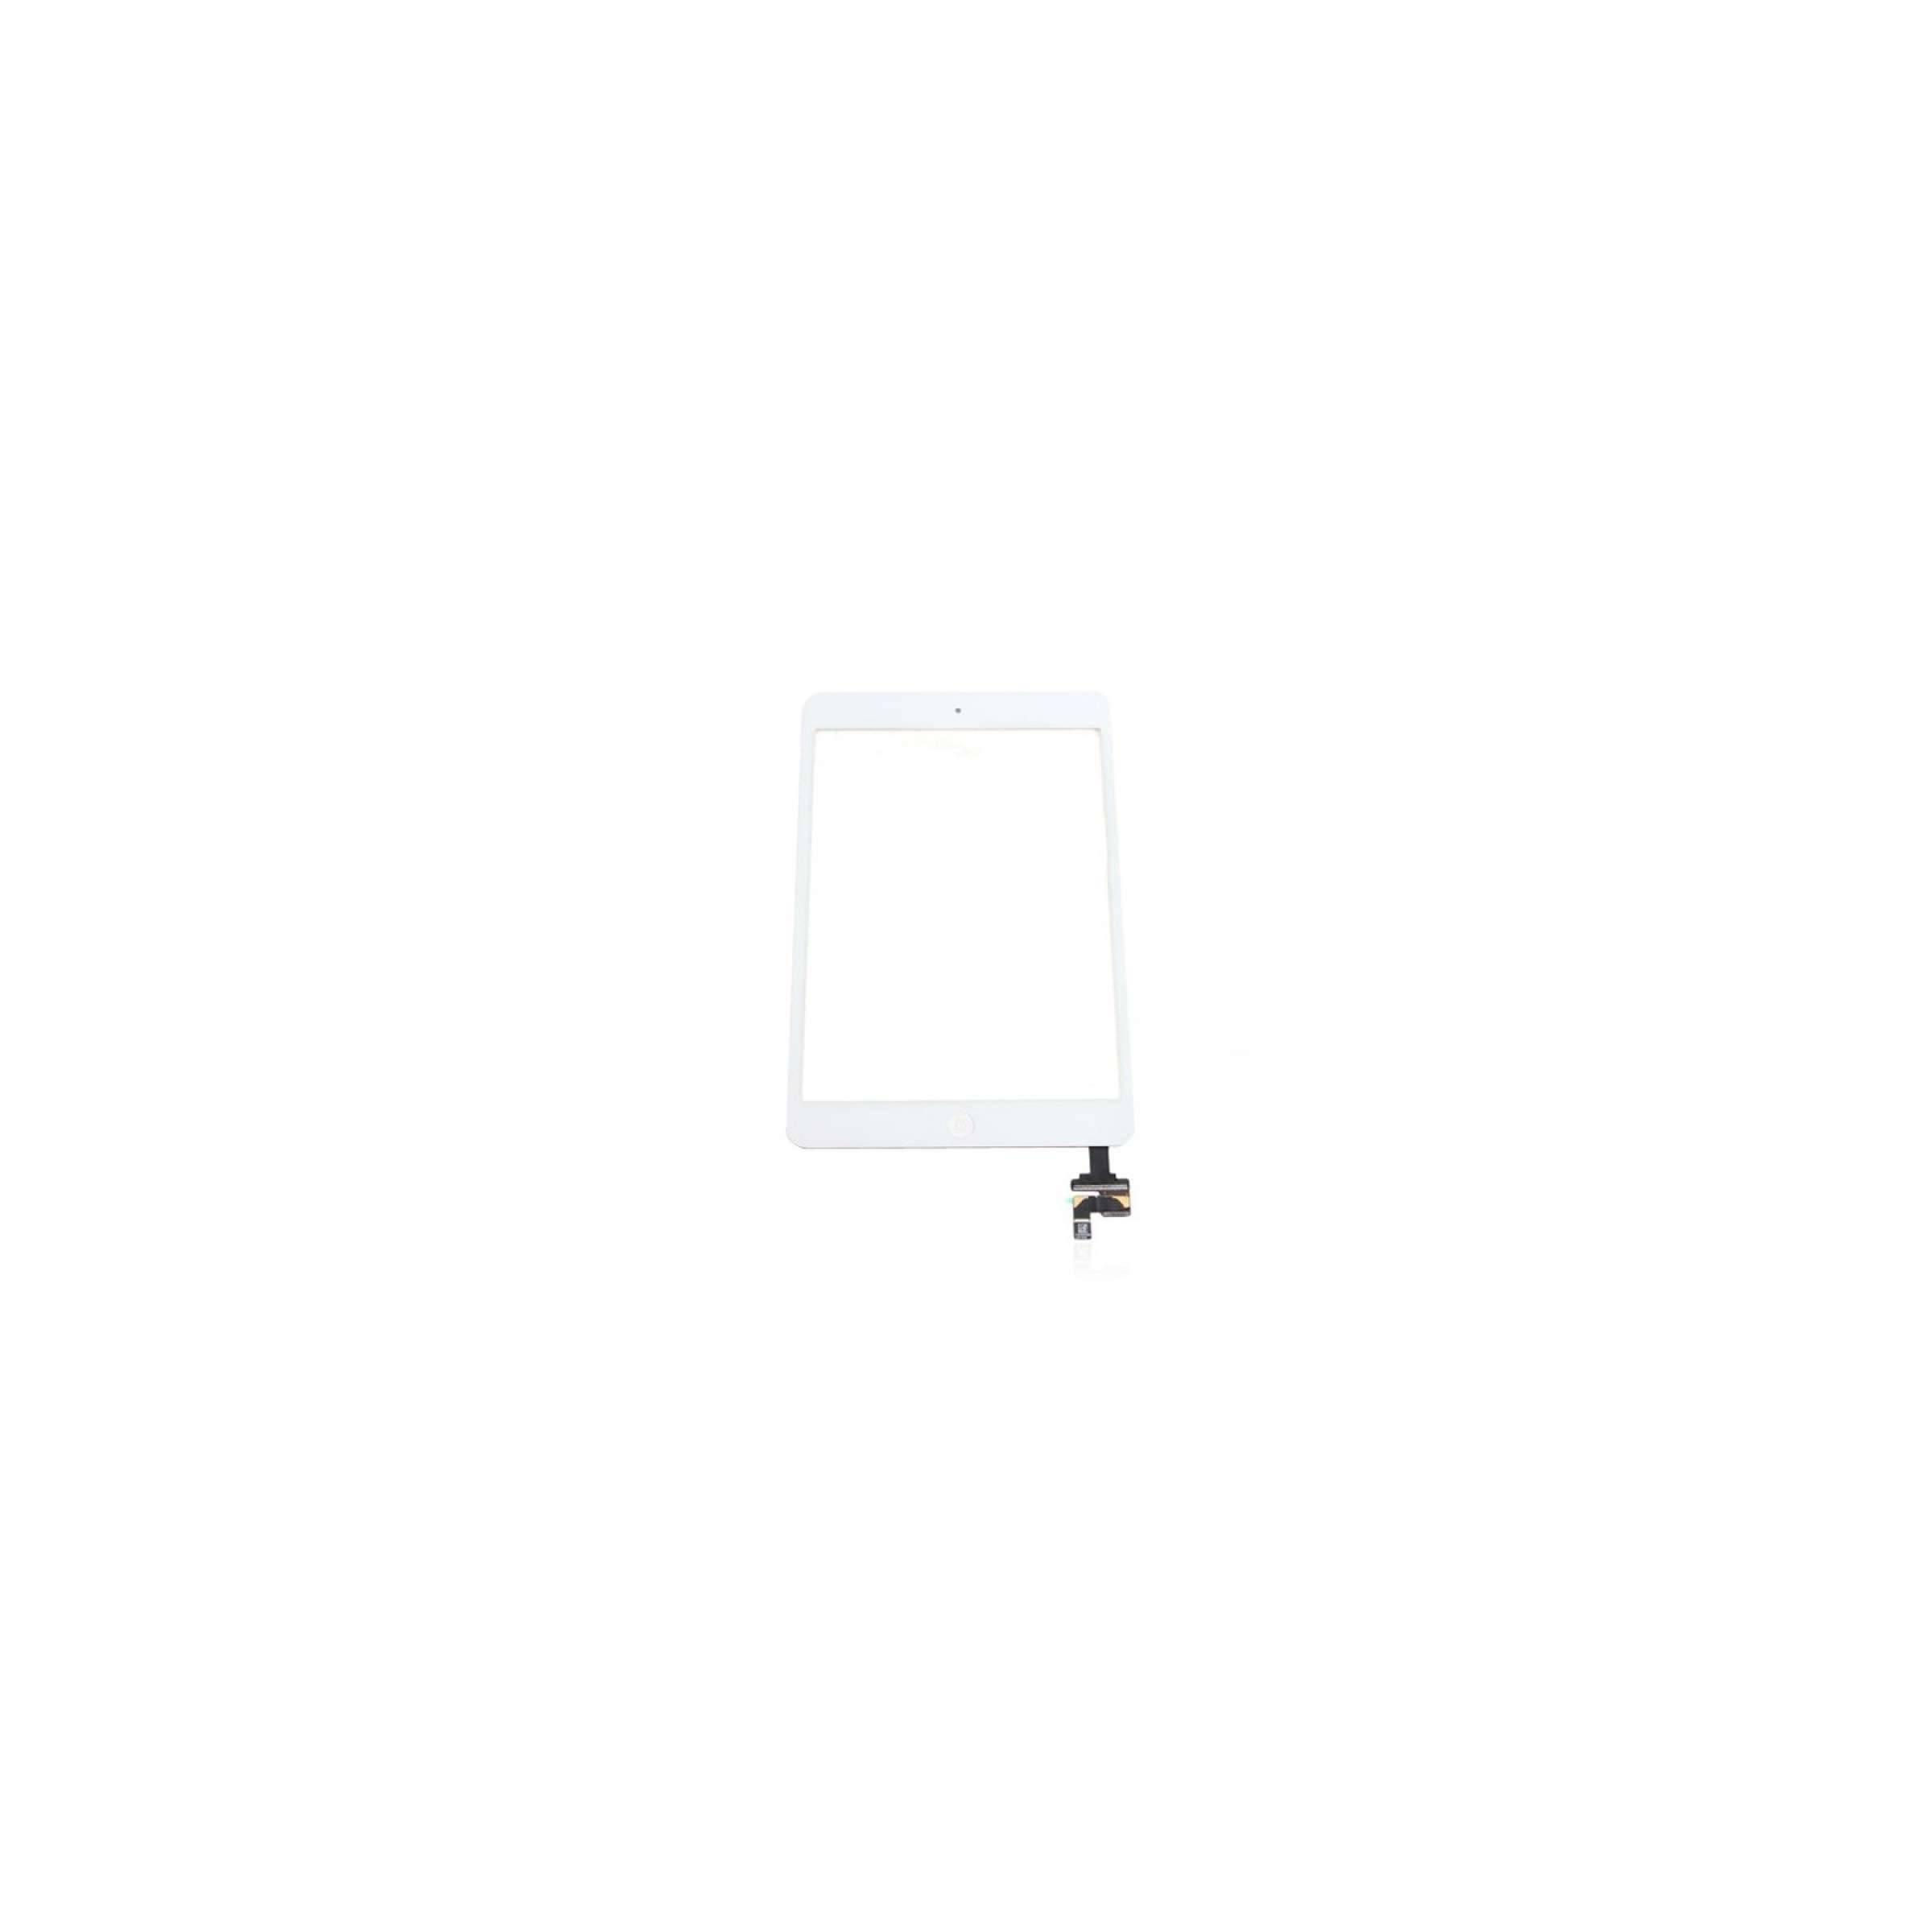 sinox ipad mini 2 skærm hvid. skærm i høj kvalitet